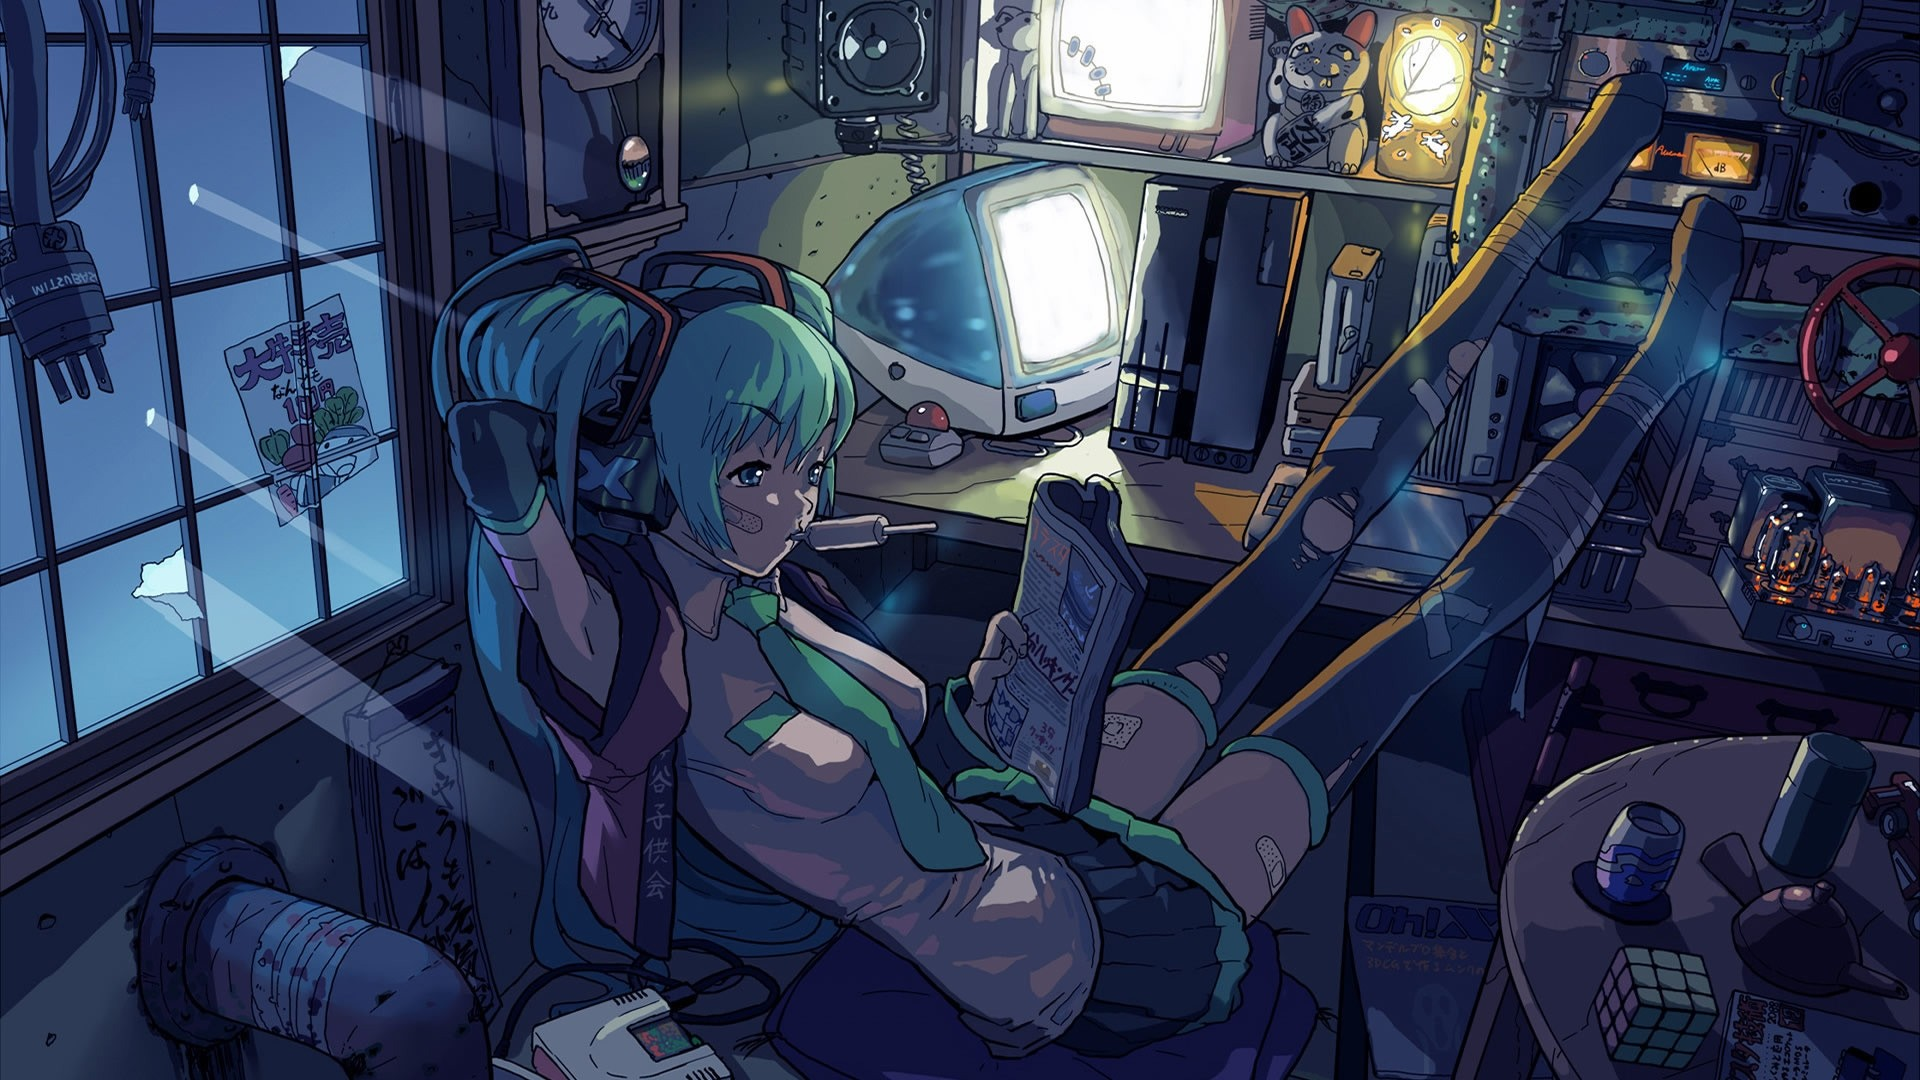 Gamer Girl download nice wallpaper